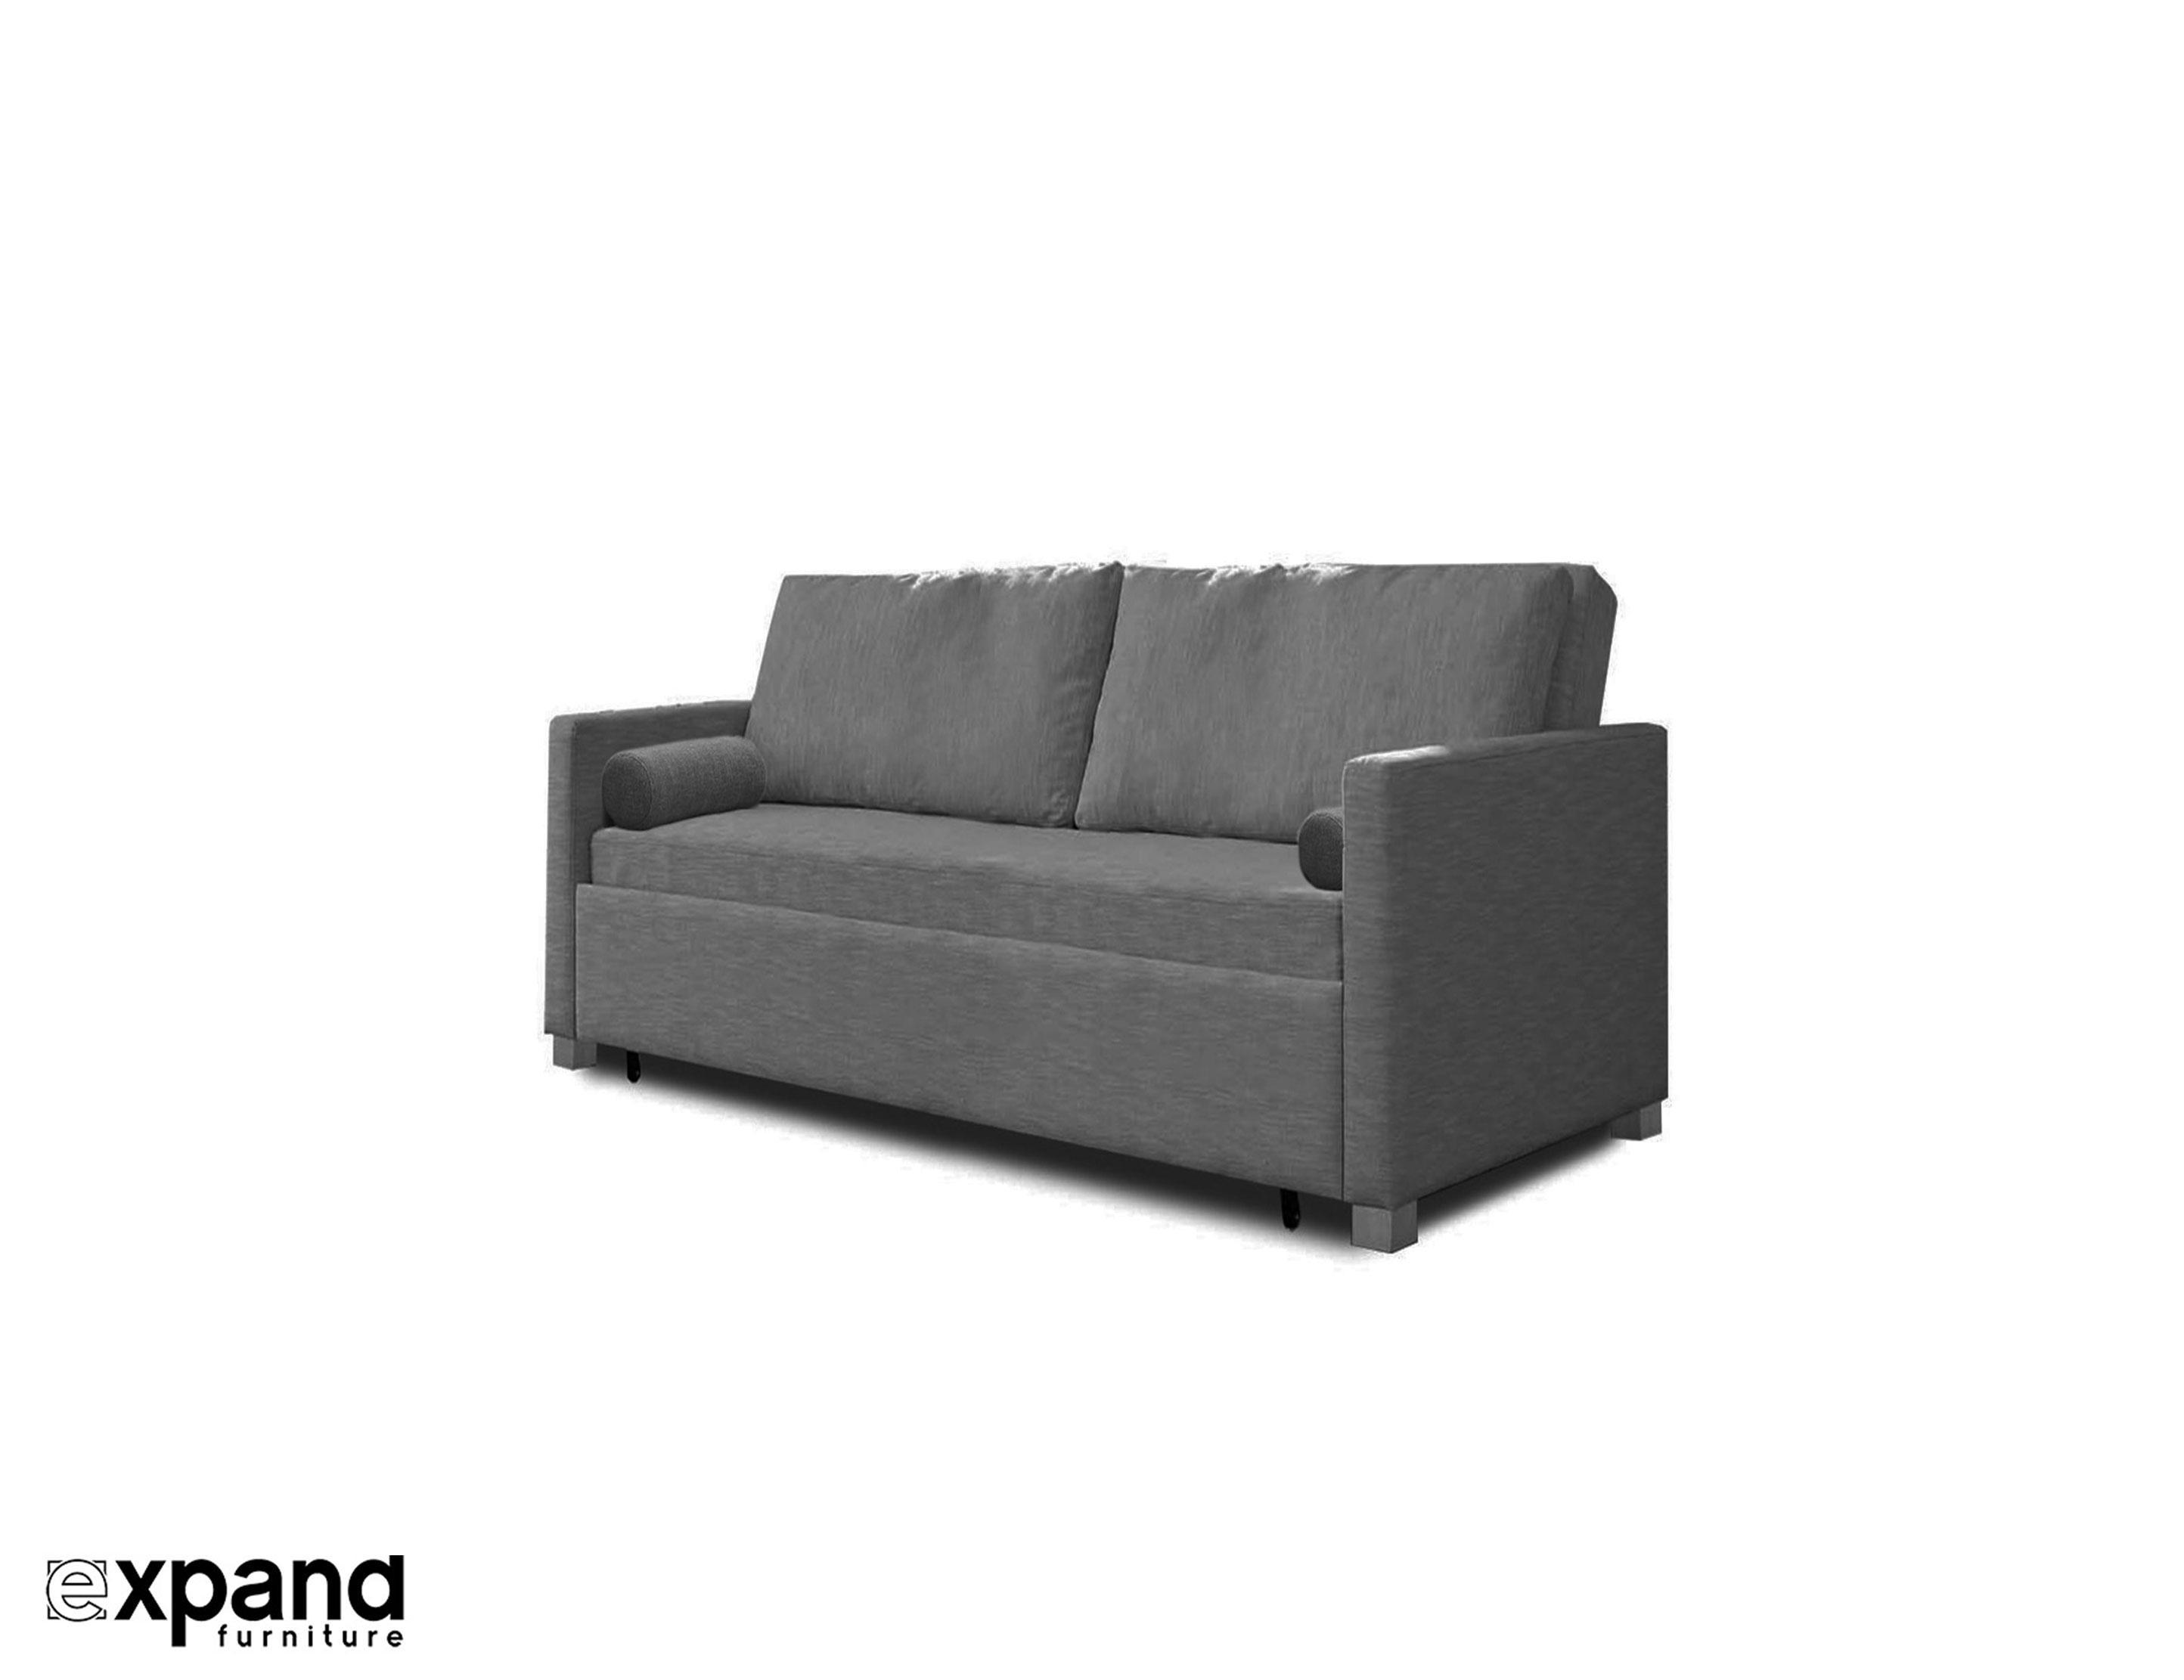 queen size memory foam mattress for sleeper sofa table barley twist 2018 latest beds ideas